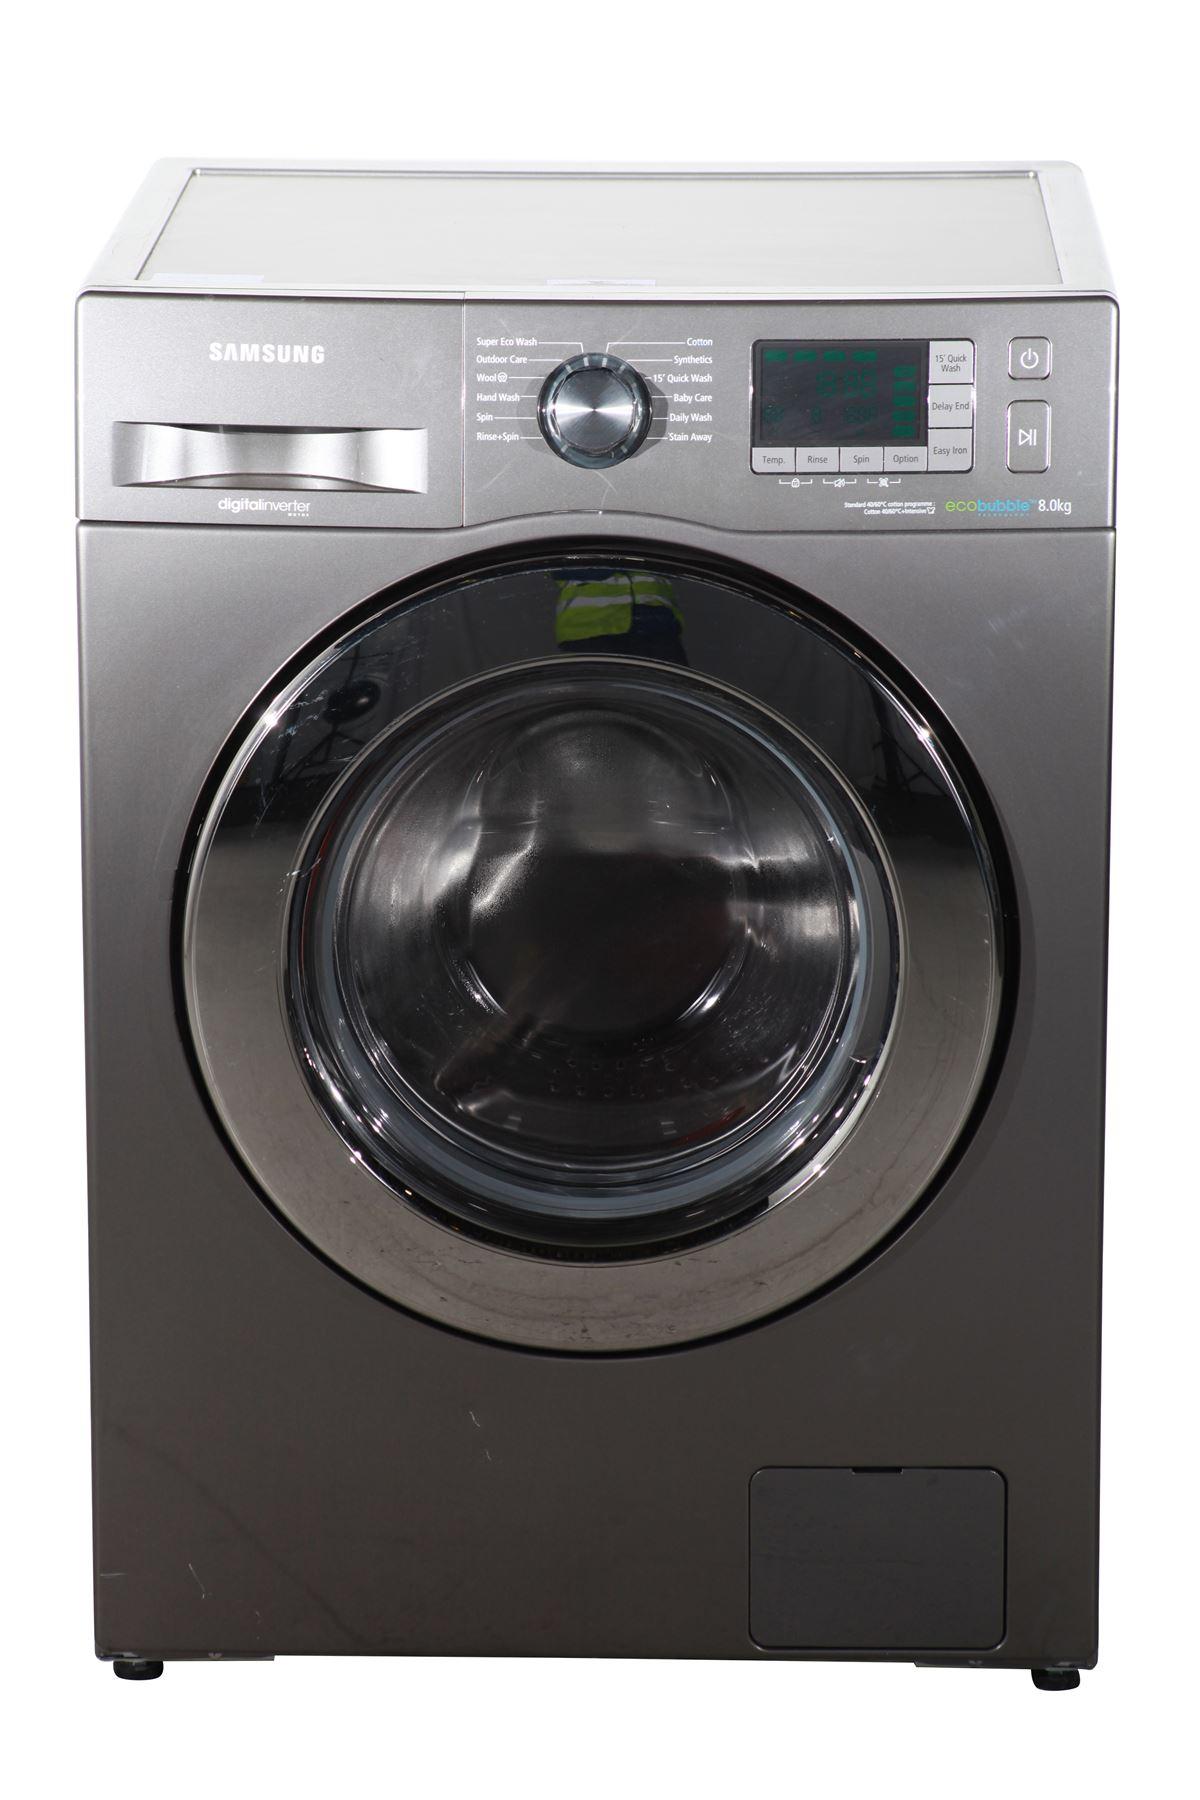 preloved samsung eco bubble 8kg washing machine wf80f5e5u4x silver for sale in edmonton. Black Bedroom Furniture Sets. Home Design Ideas